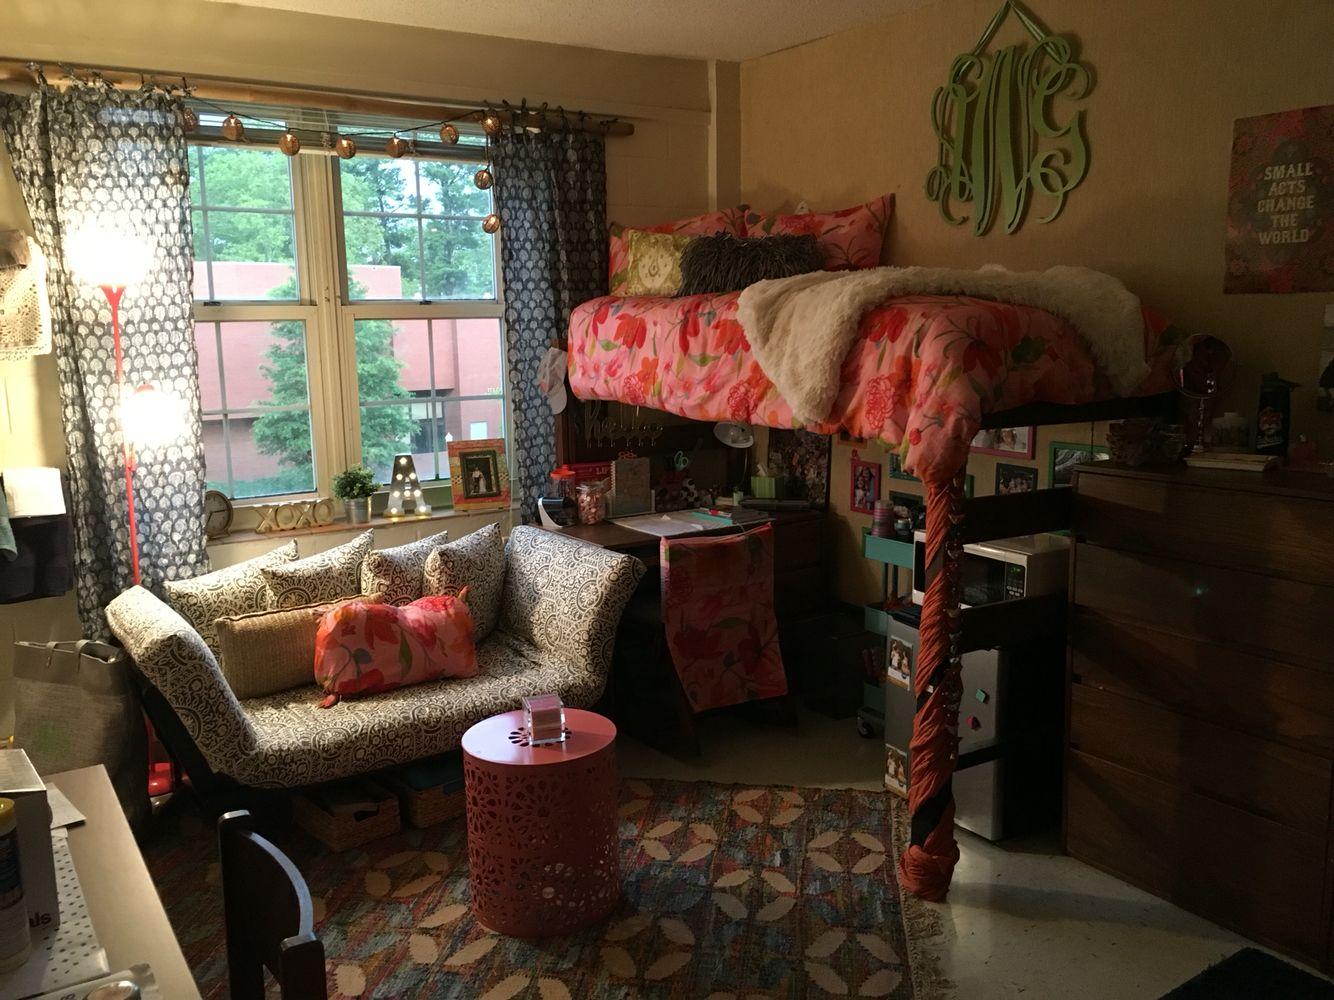 Freshman Year Dorm Room Life Auburn University Dobbs In The Hill Part 34